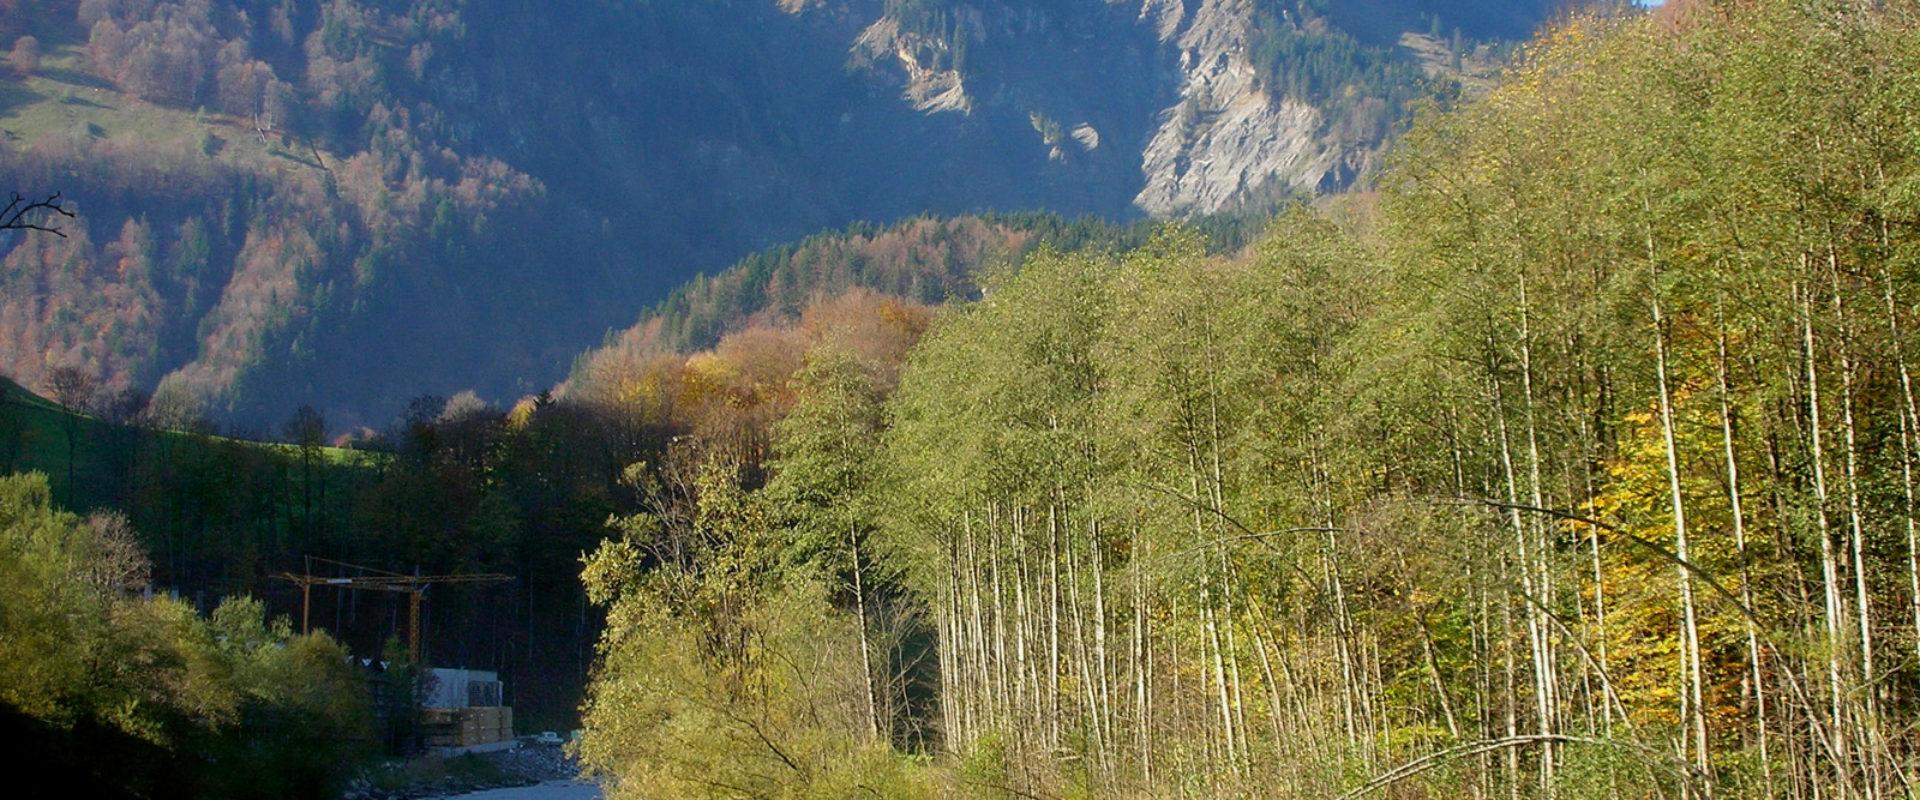 Mellau Hangspitze